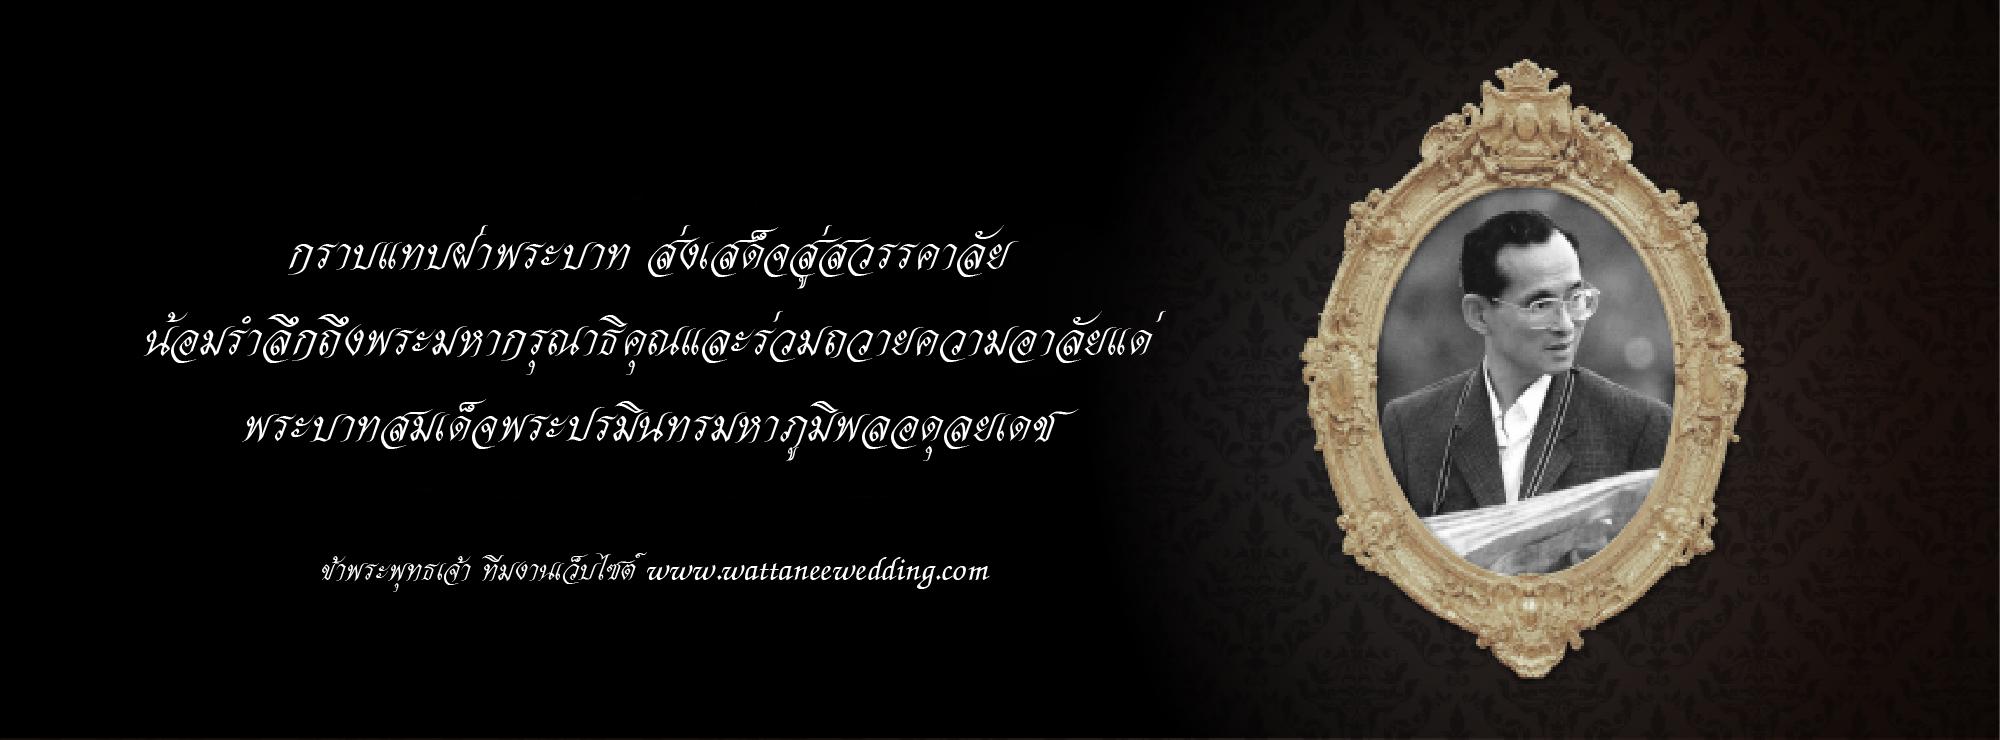 Wattanee Wedding